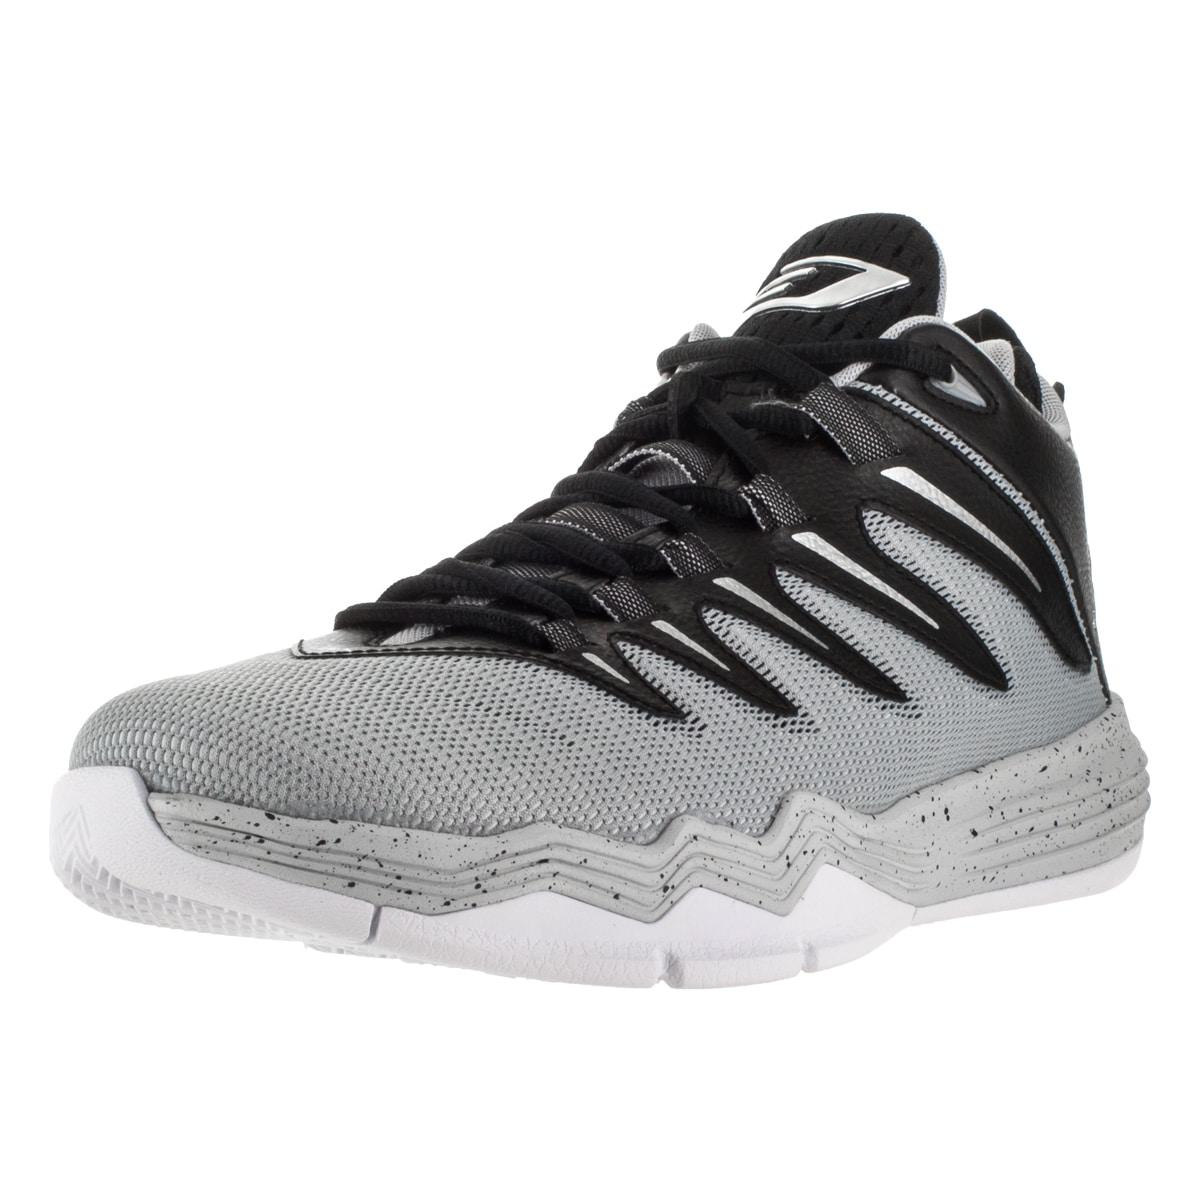 huge discount 76f1b ea21b Shop Nike Jordan Men s Jordan Cp3.Ix Black Metallic Silver Wlf  Pr Plt Basketball  Shoe - Free Shipping Today - Overstock - 12318263